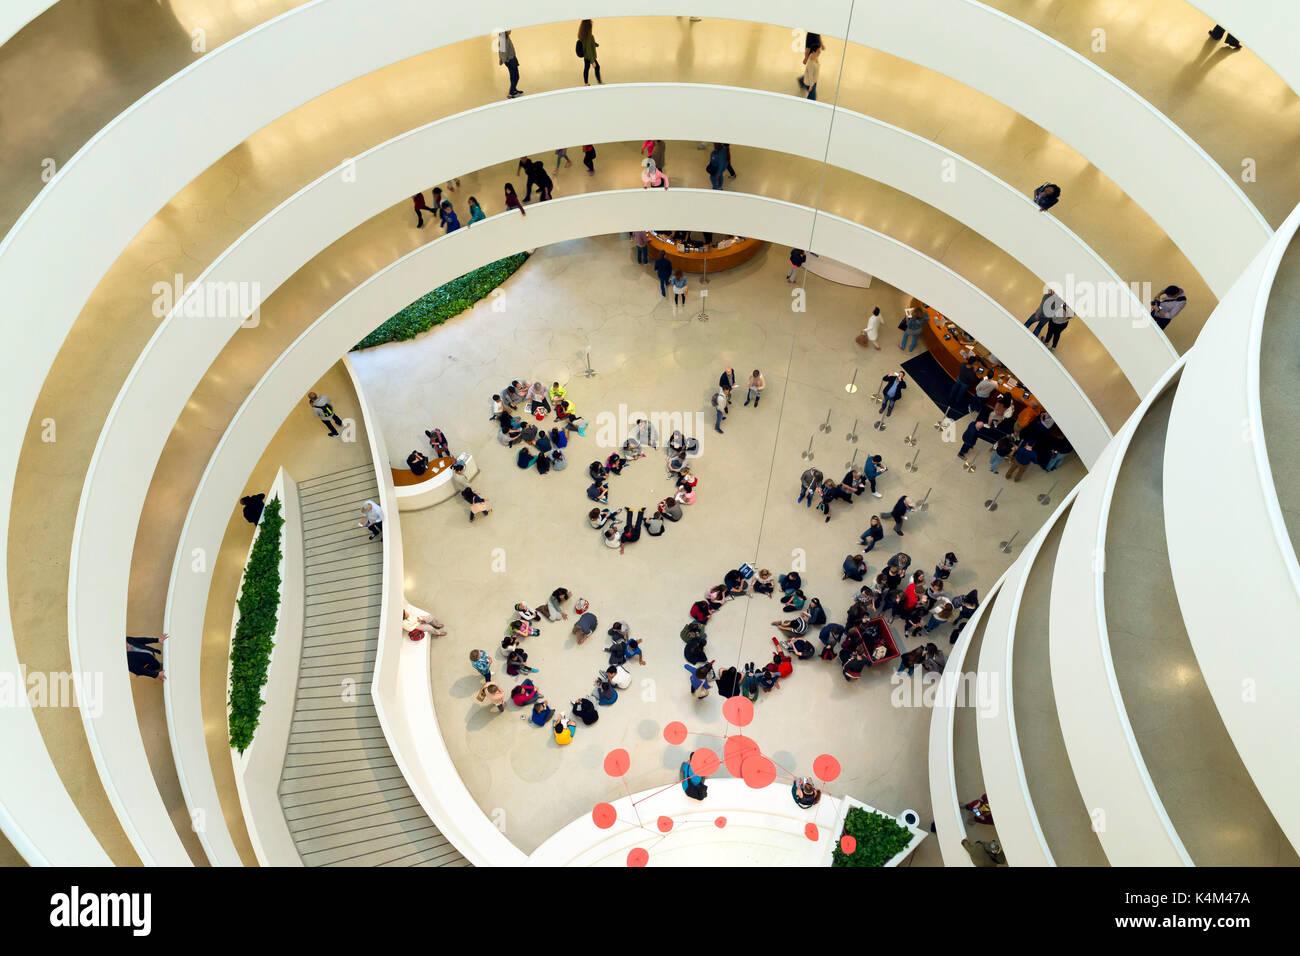 Interior of Solomon R Guggenheim Museum with schoolchildren, Manhattan, New York, USA Stock Photo